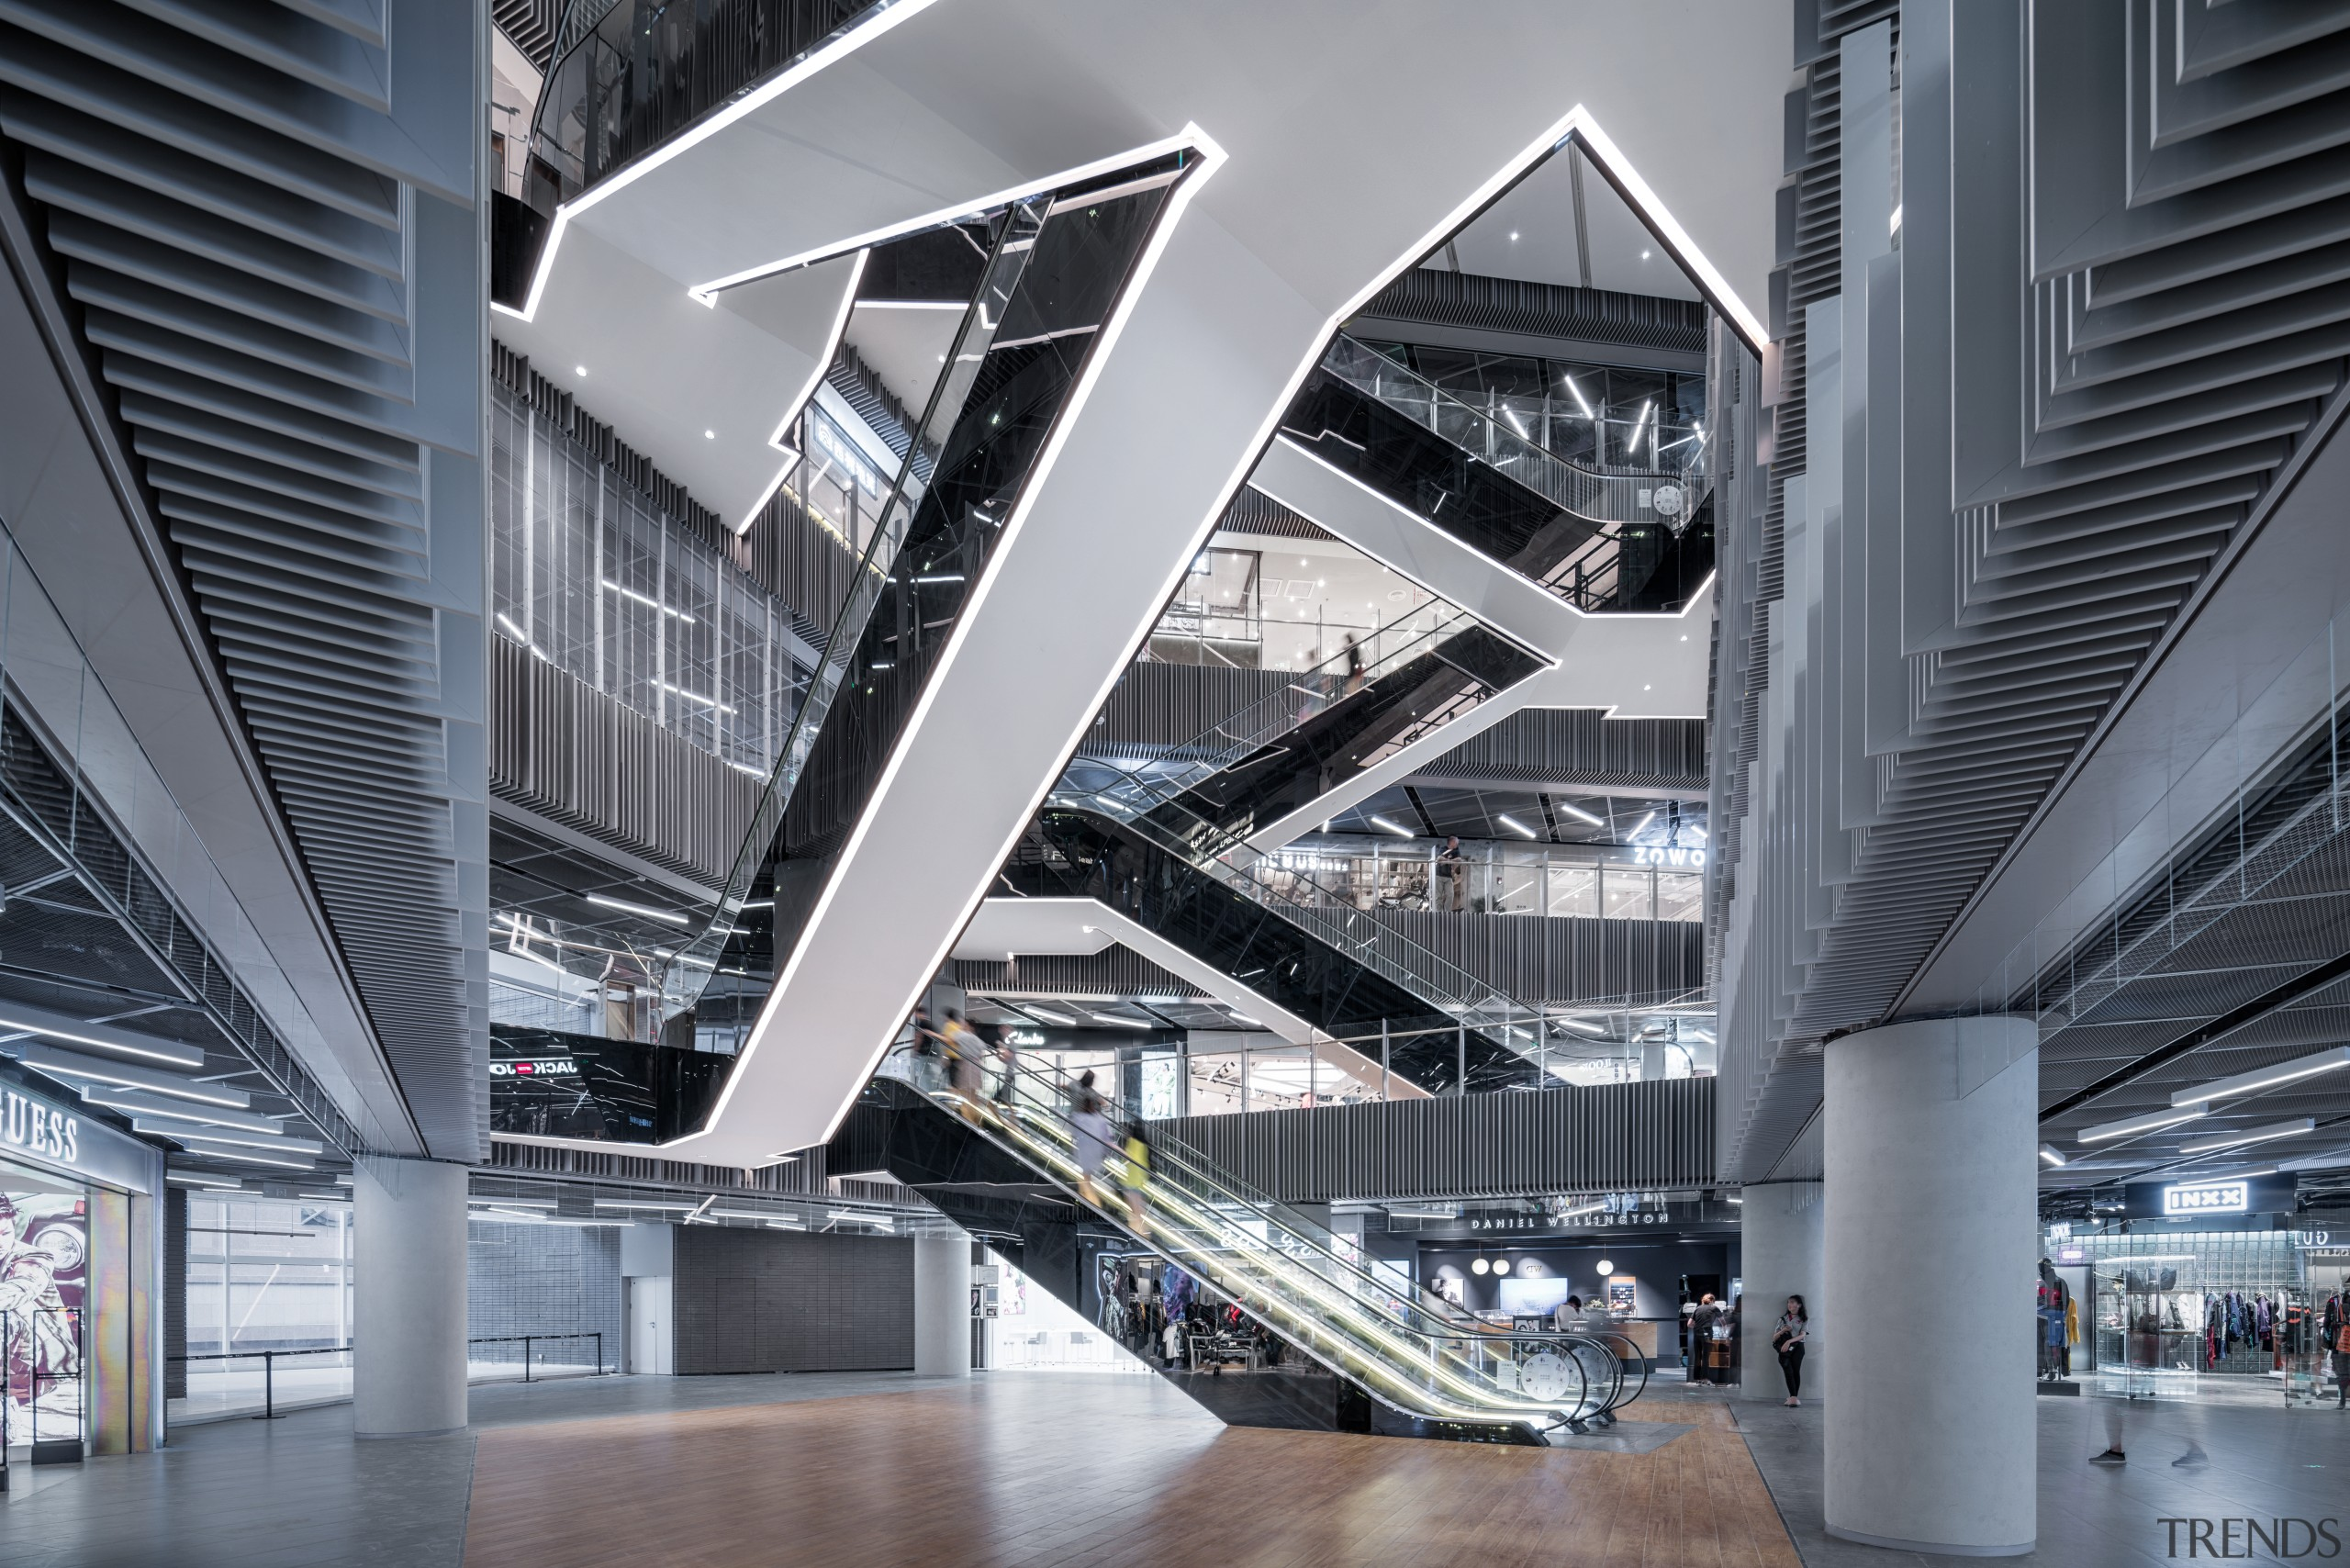 Scissor stairs slice through Shimao Festival City mall's architecture, building, scissor stairs,  Shimao Festival City,  Mall, plaza